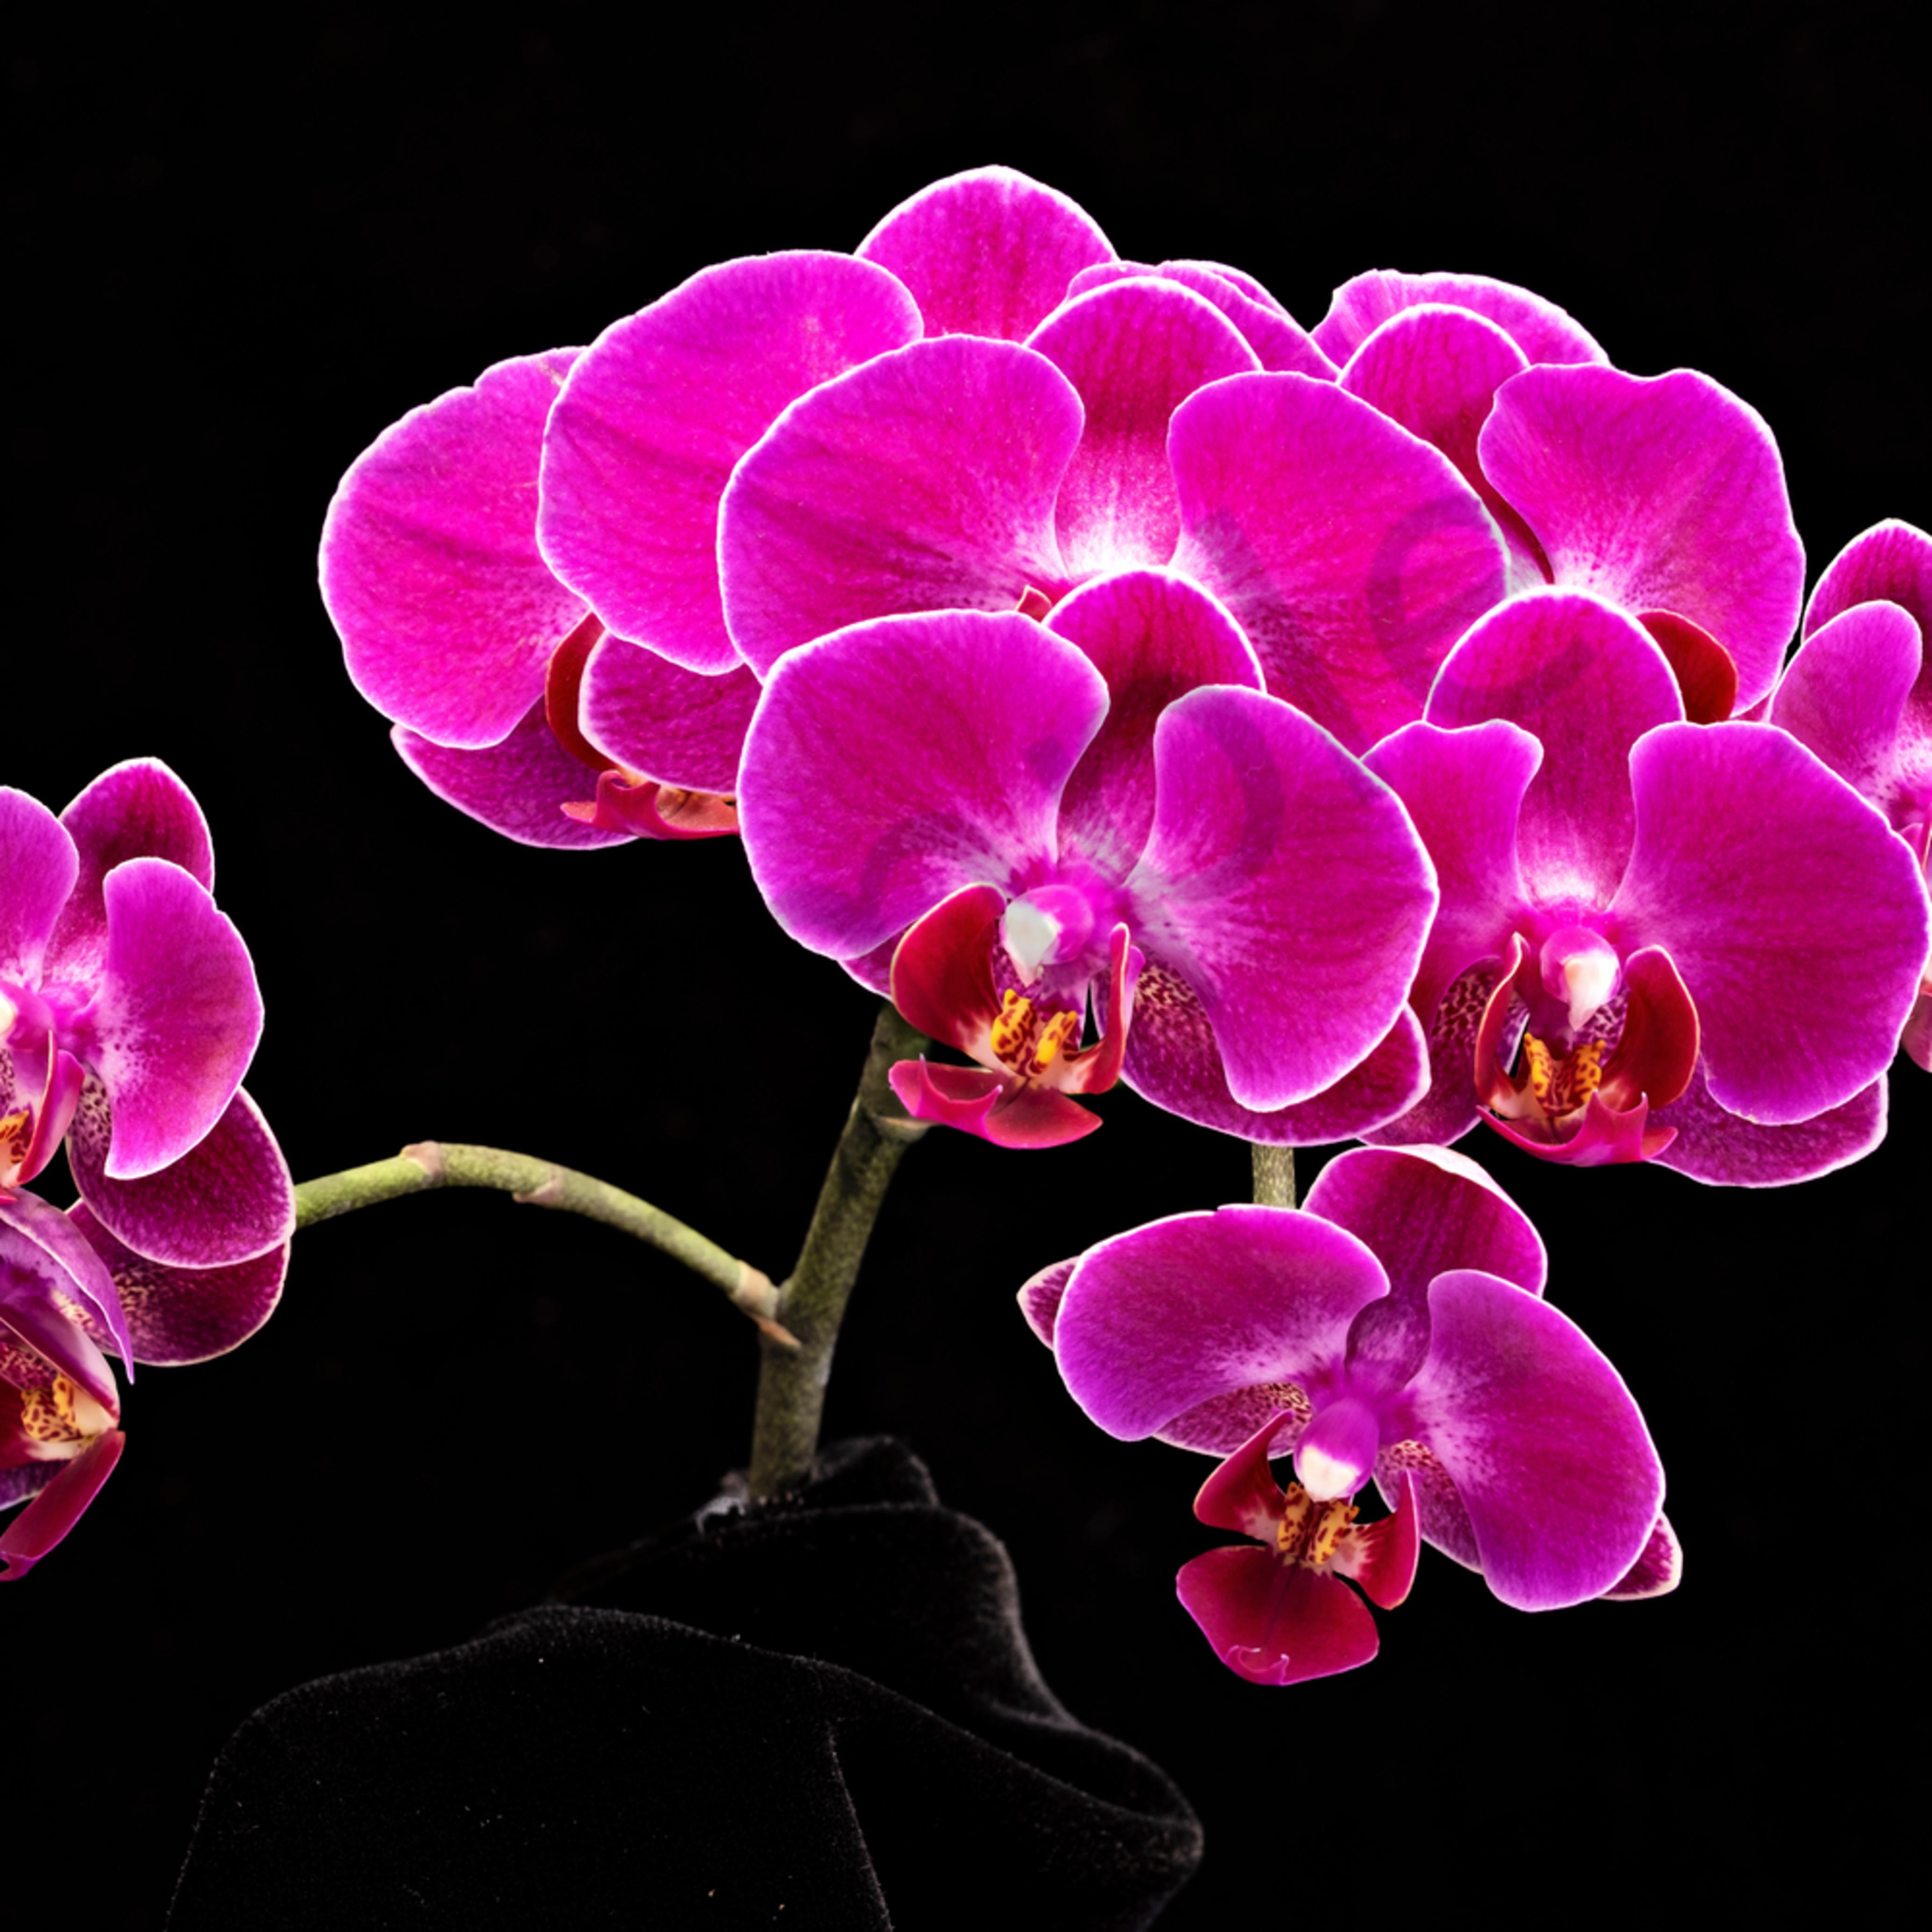 Pinkorchids zsoadw